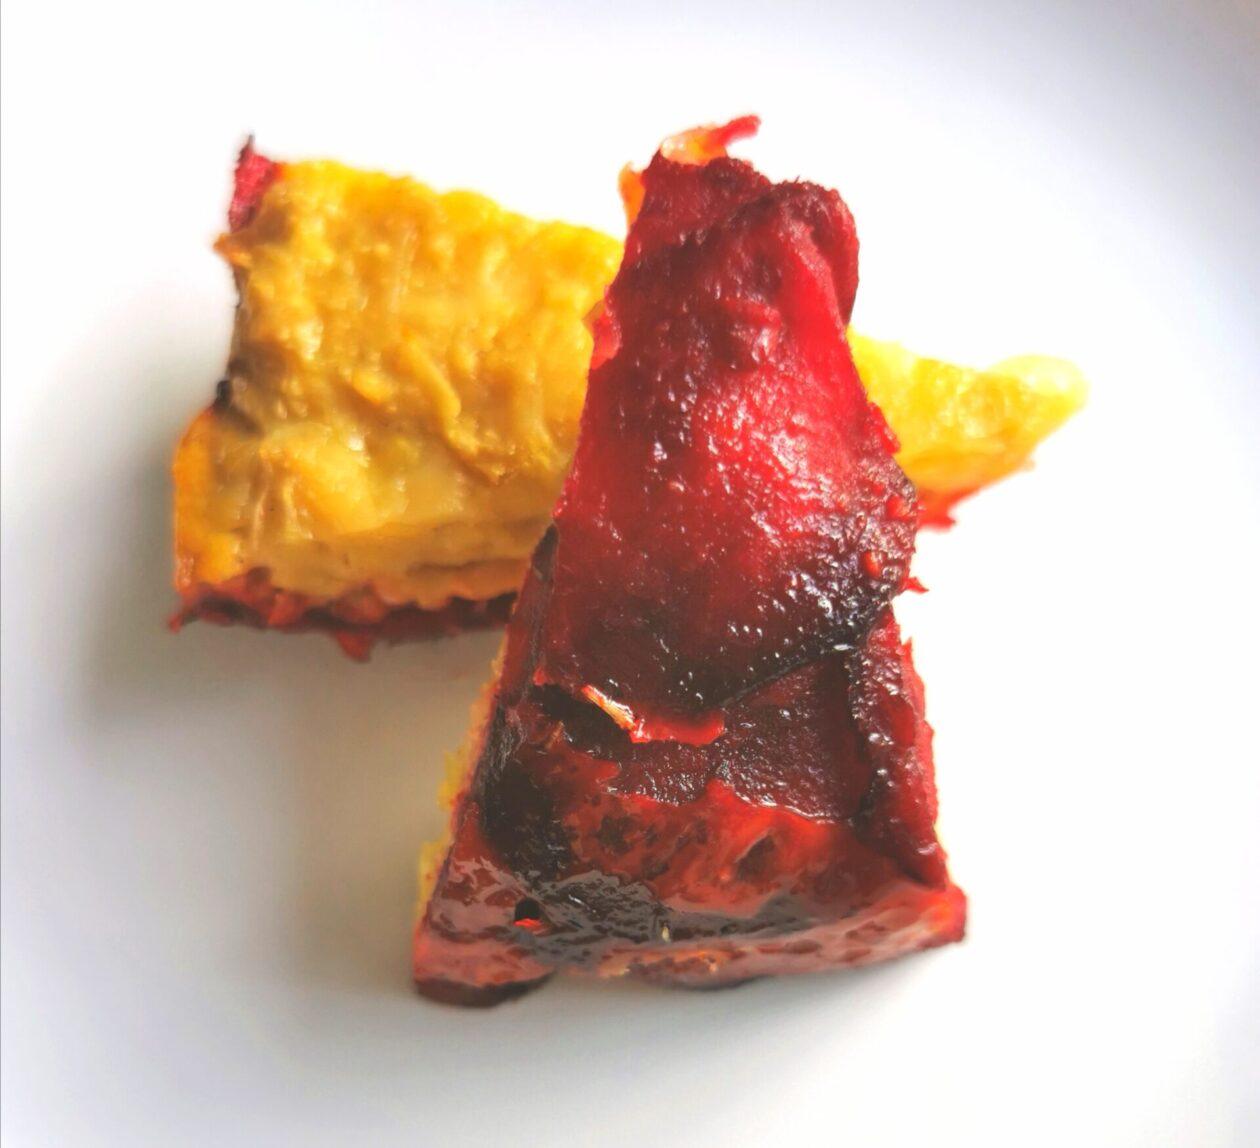 Kartoffel rösti på rødbedebund